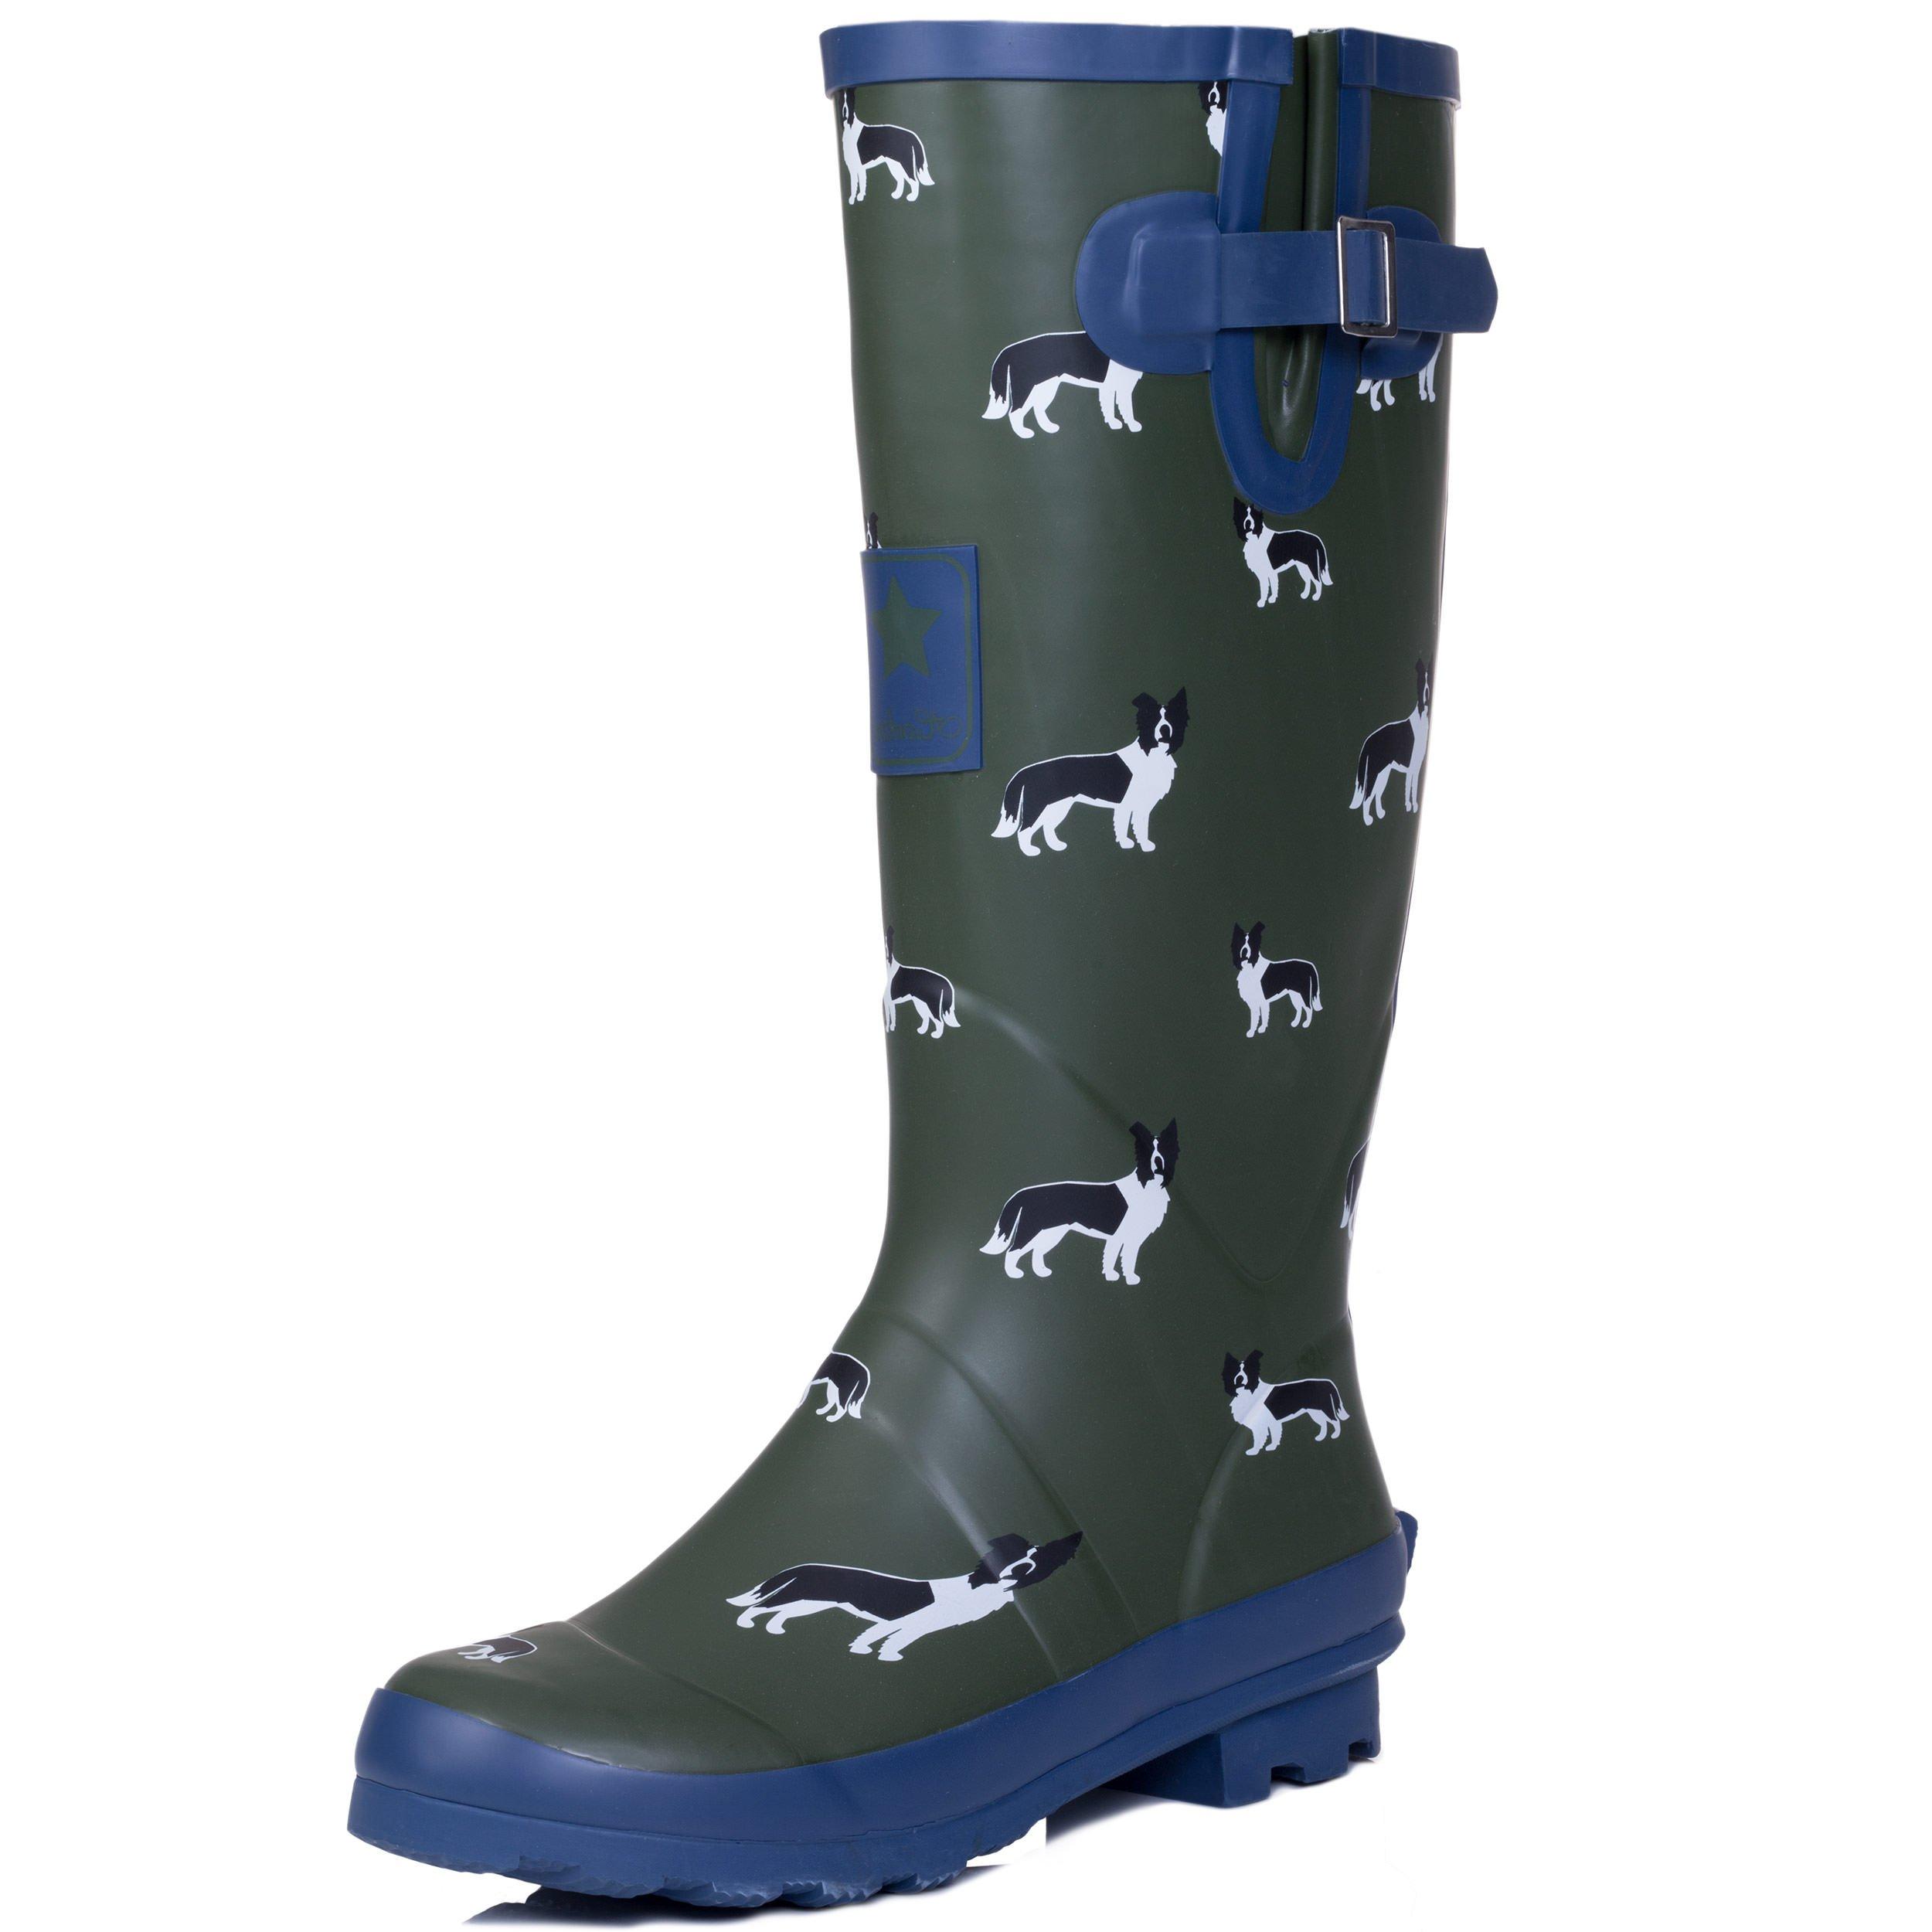 Spylovebuy Adjustable Buckle Flat Festival Wellies Rain Boots Border Collie Dog Sz 7